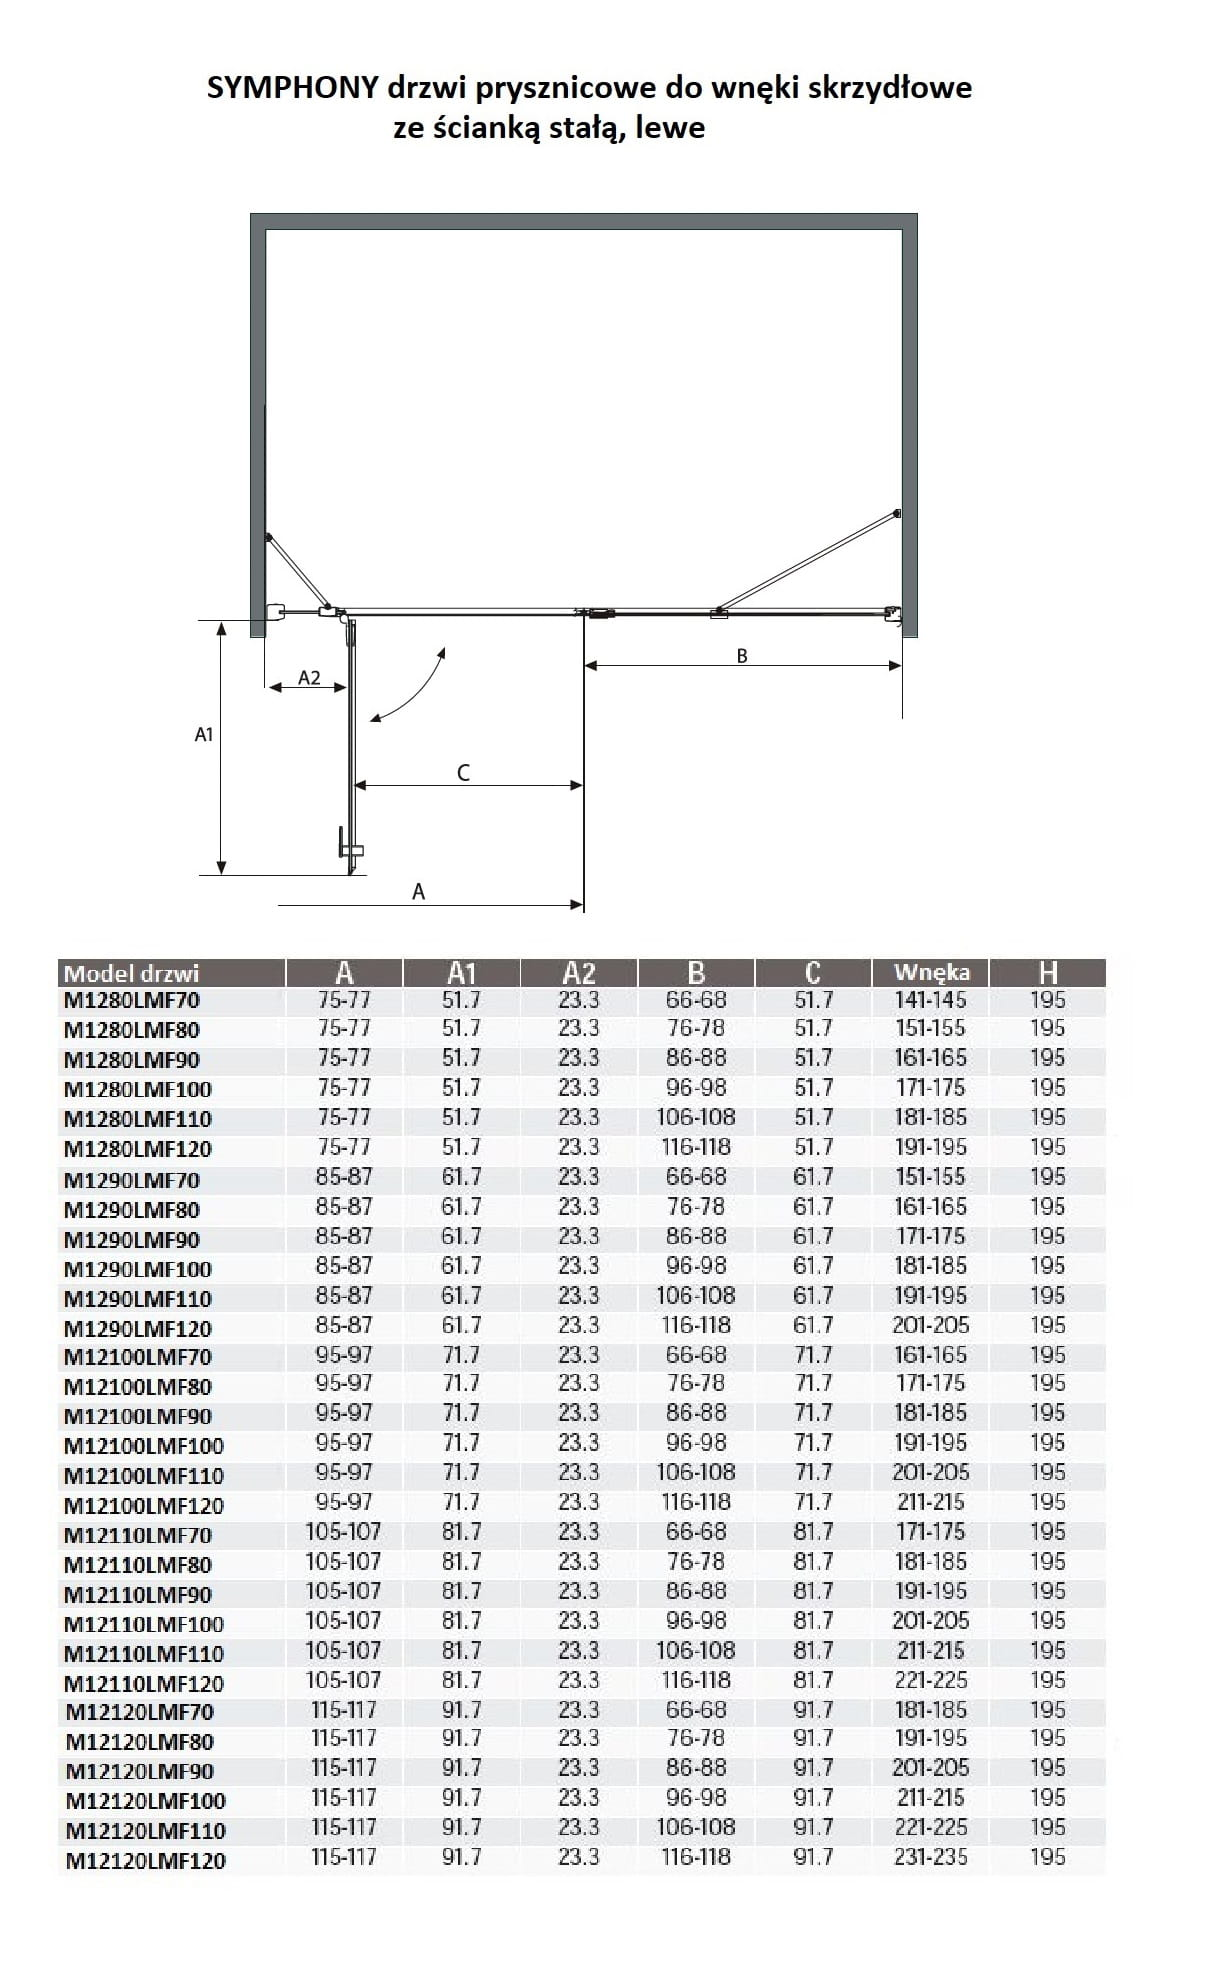 Sanotechnik - SYMPHONY - Sprchové dvere do výklenku pre krídlo, ľavé 190 x 195 cm